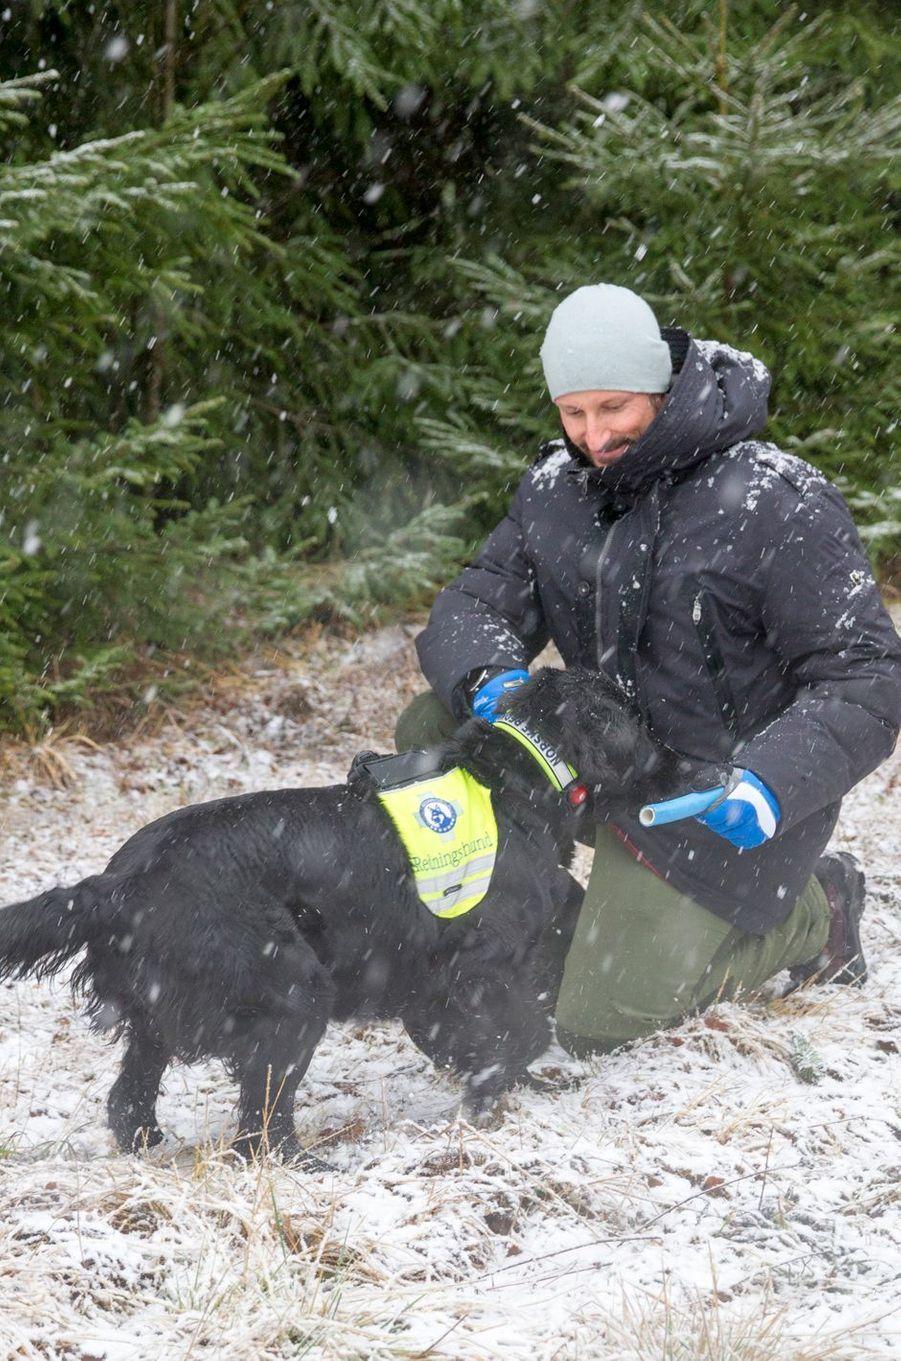 Mette Marit Haakon Norvege À Ski 11 Janv 2017 9